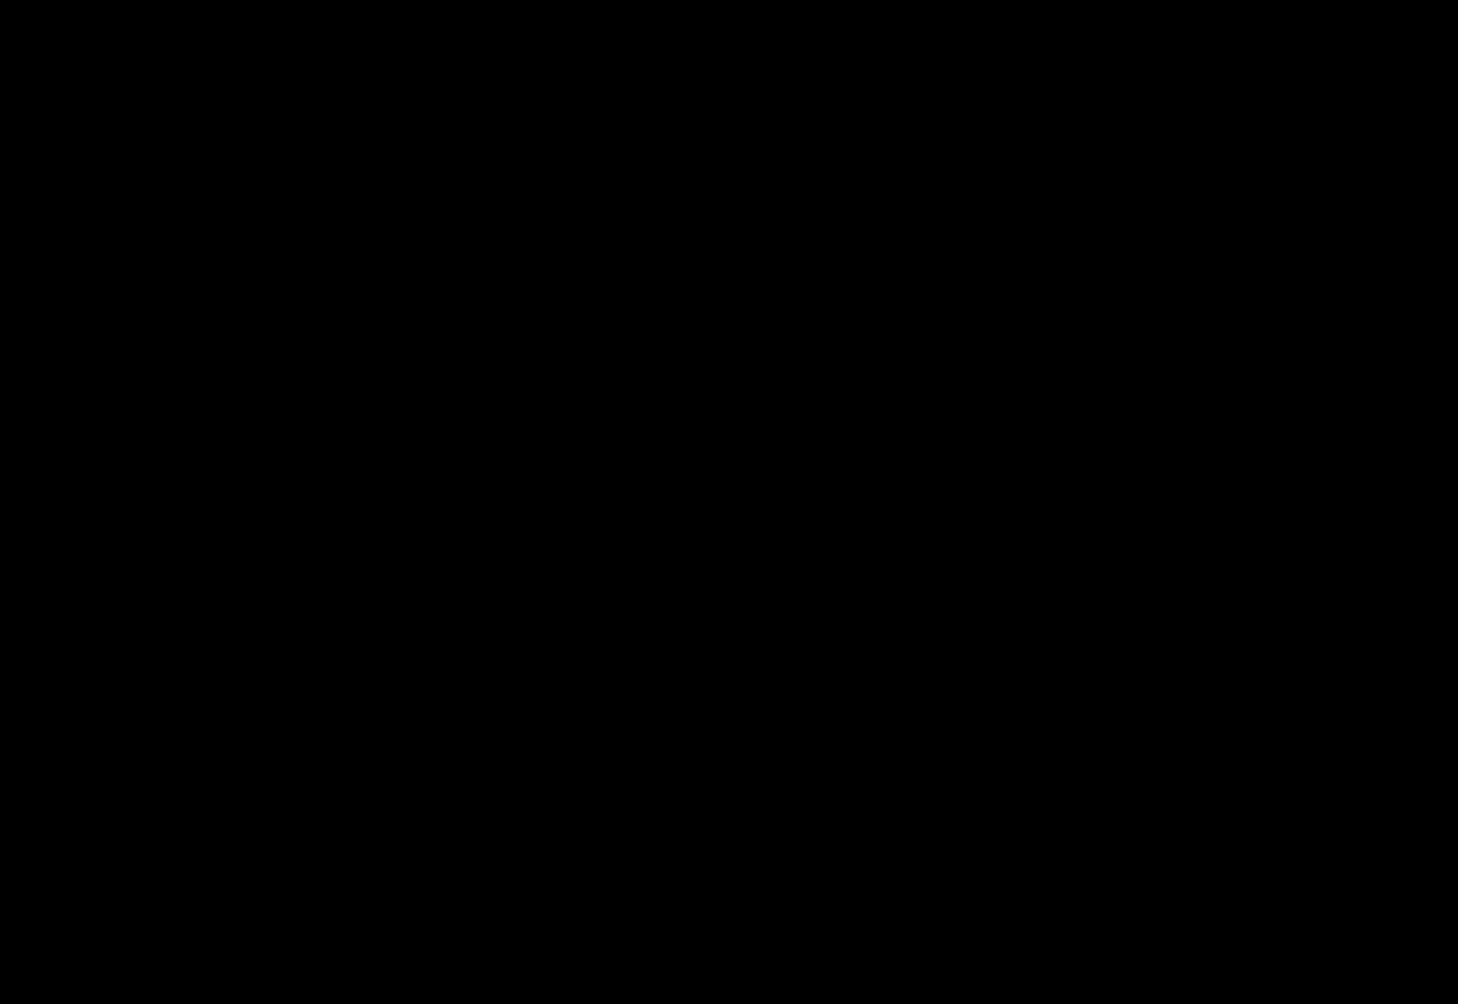 Leflunomide 3-isomer